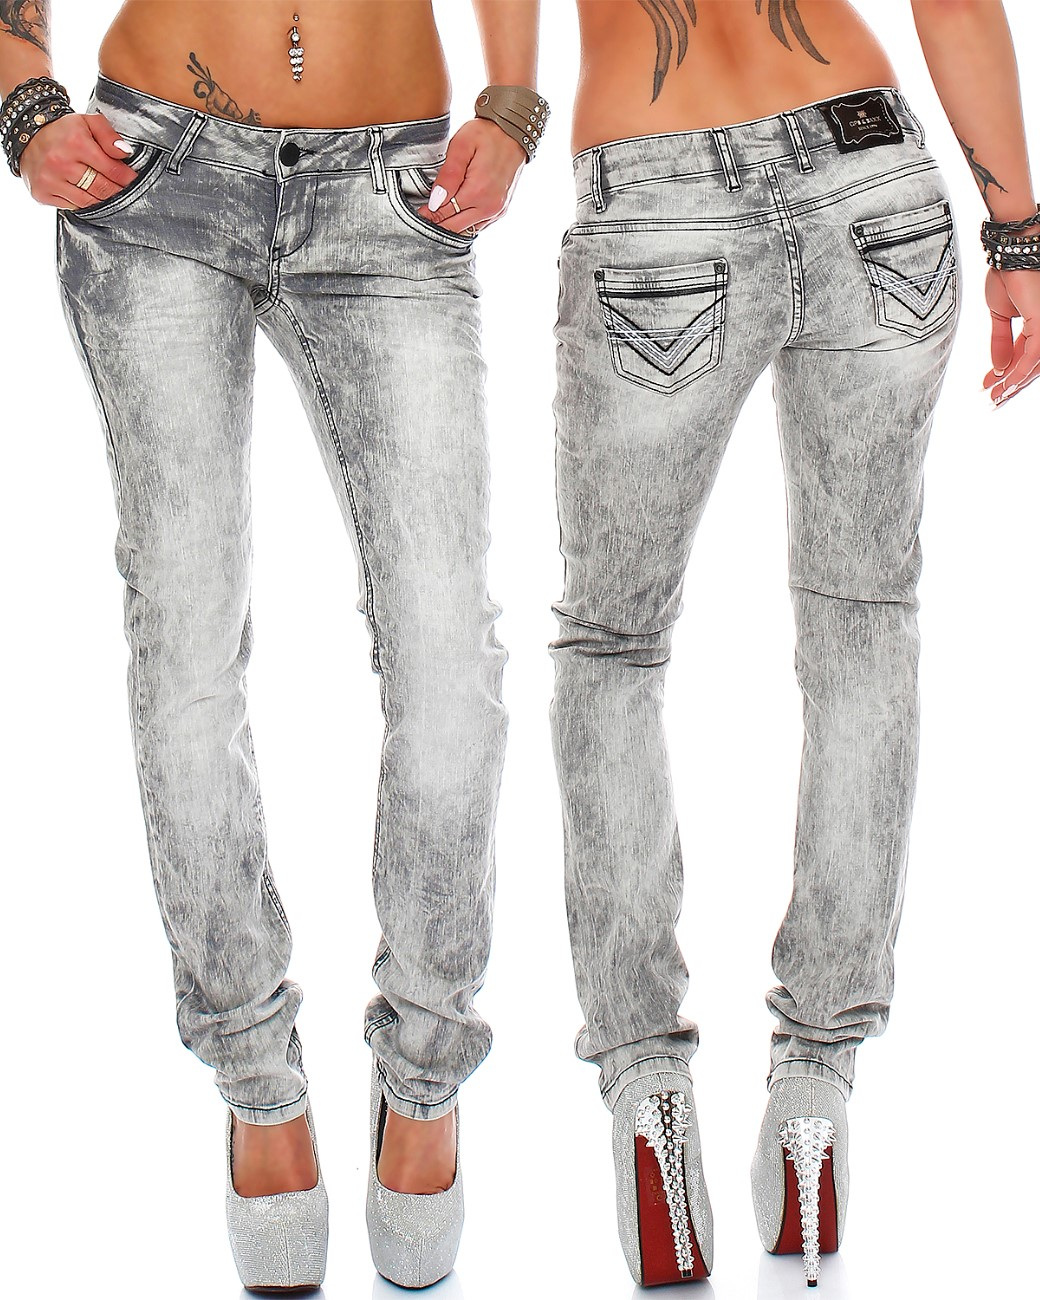 cipo baxx sexy damen jeans stretch r hre hose slim stright fit skinny h ftjeans ebay. Black Bedroom Furniture Sets. Home Design Ideas